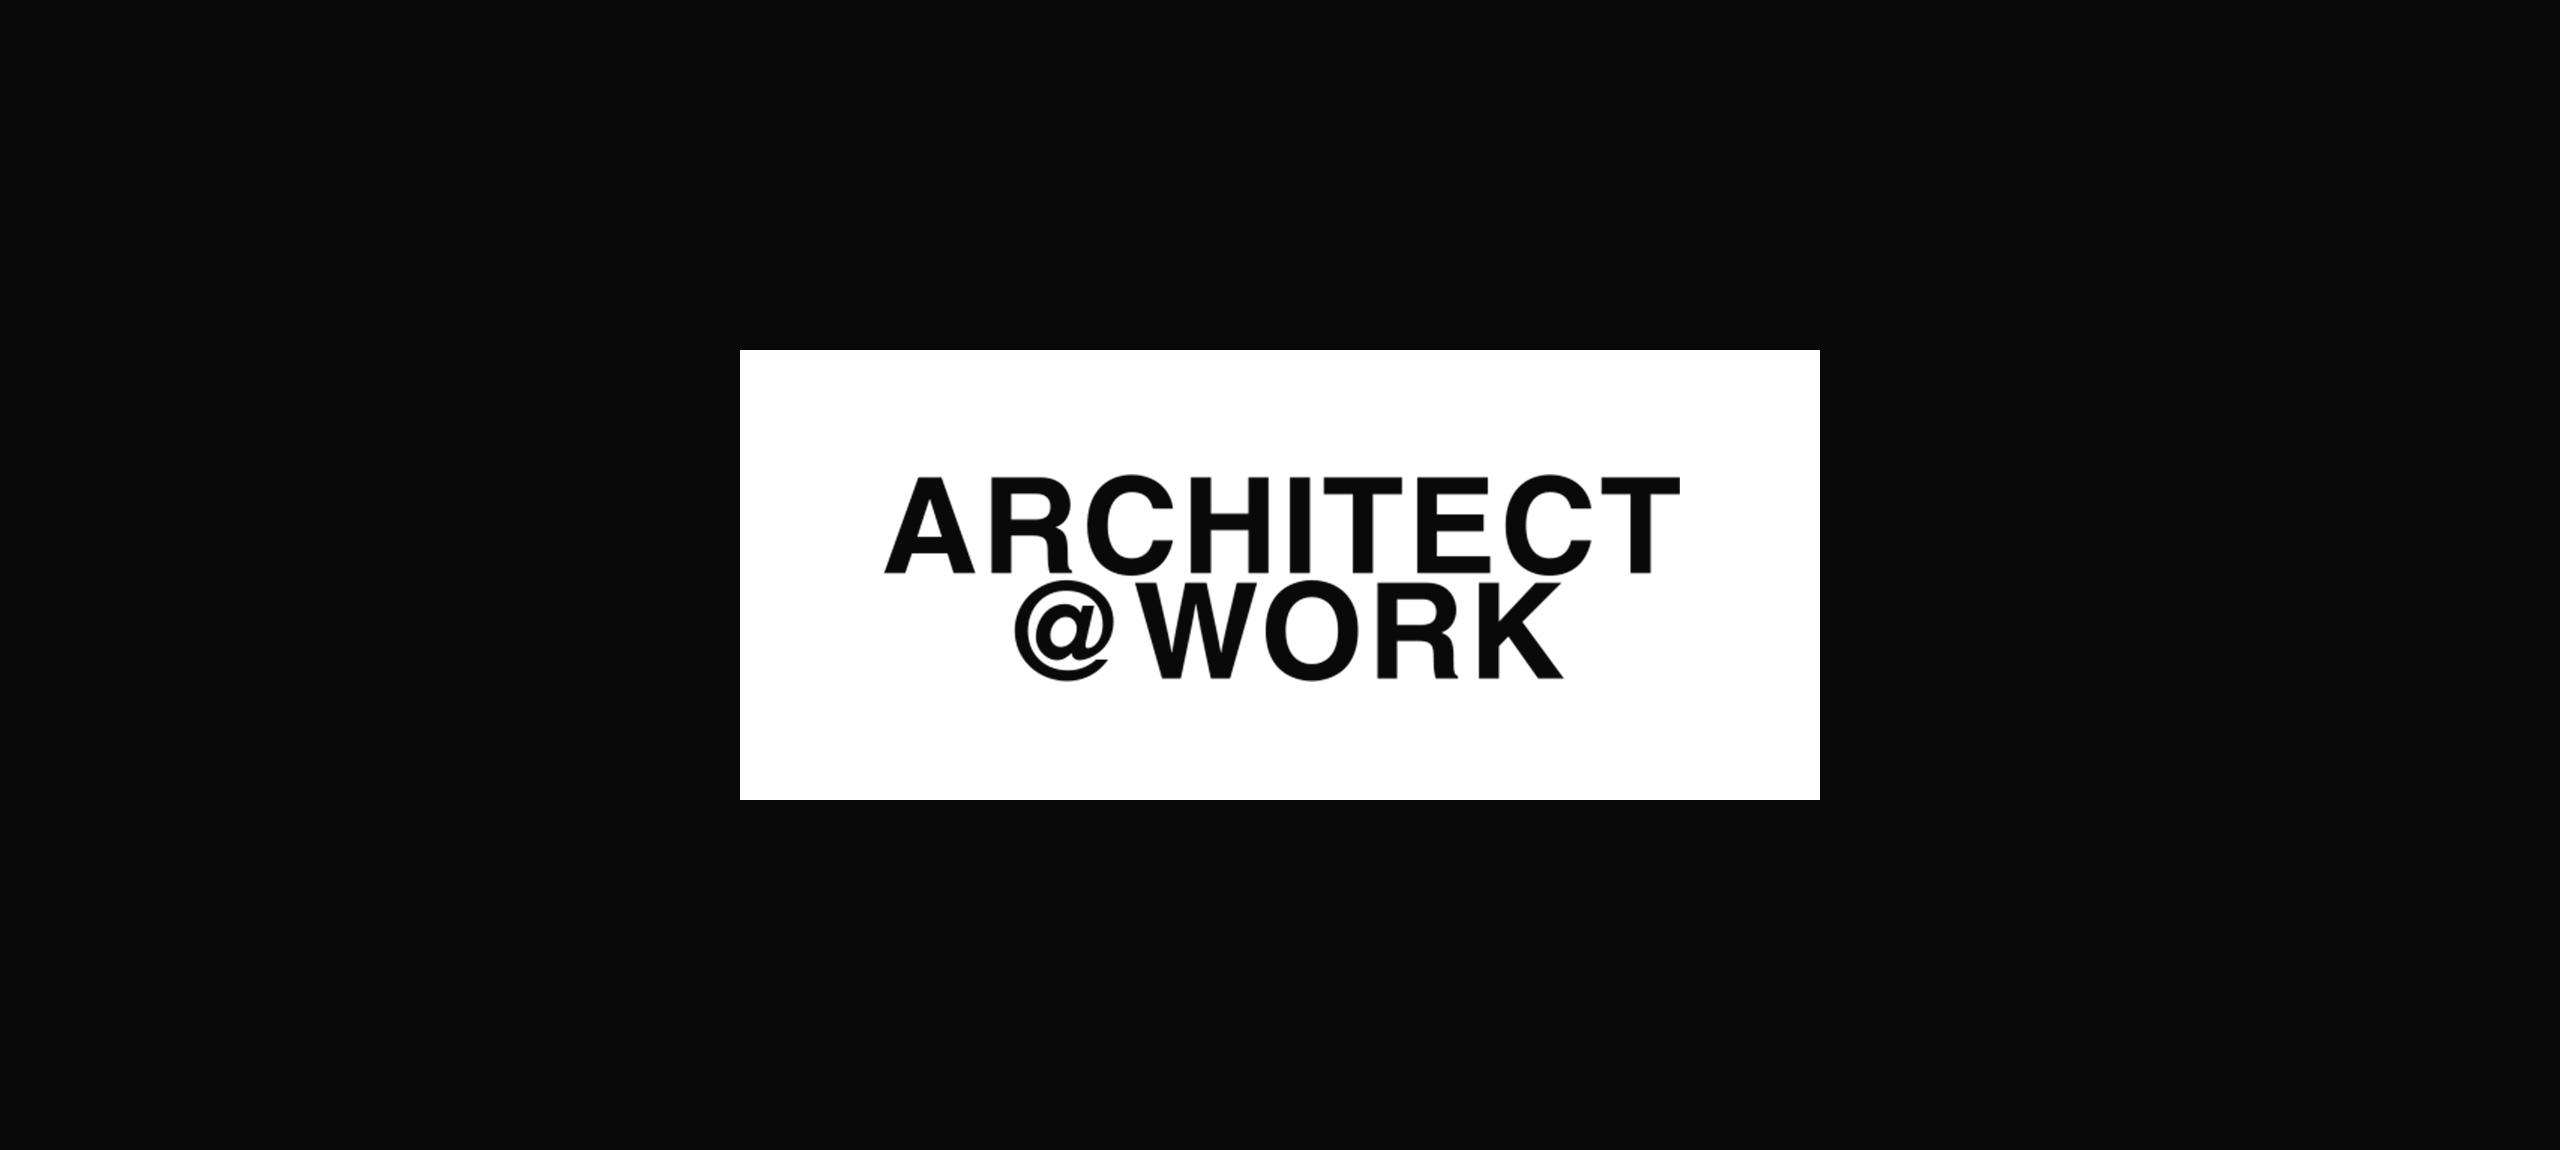 fullscreen_architect@work